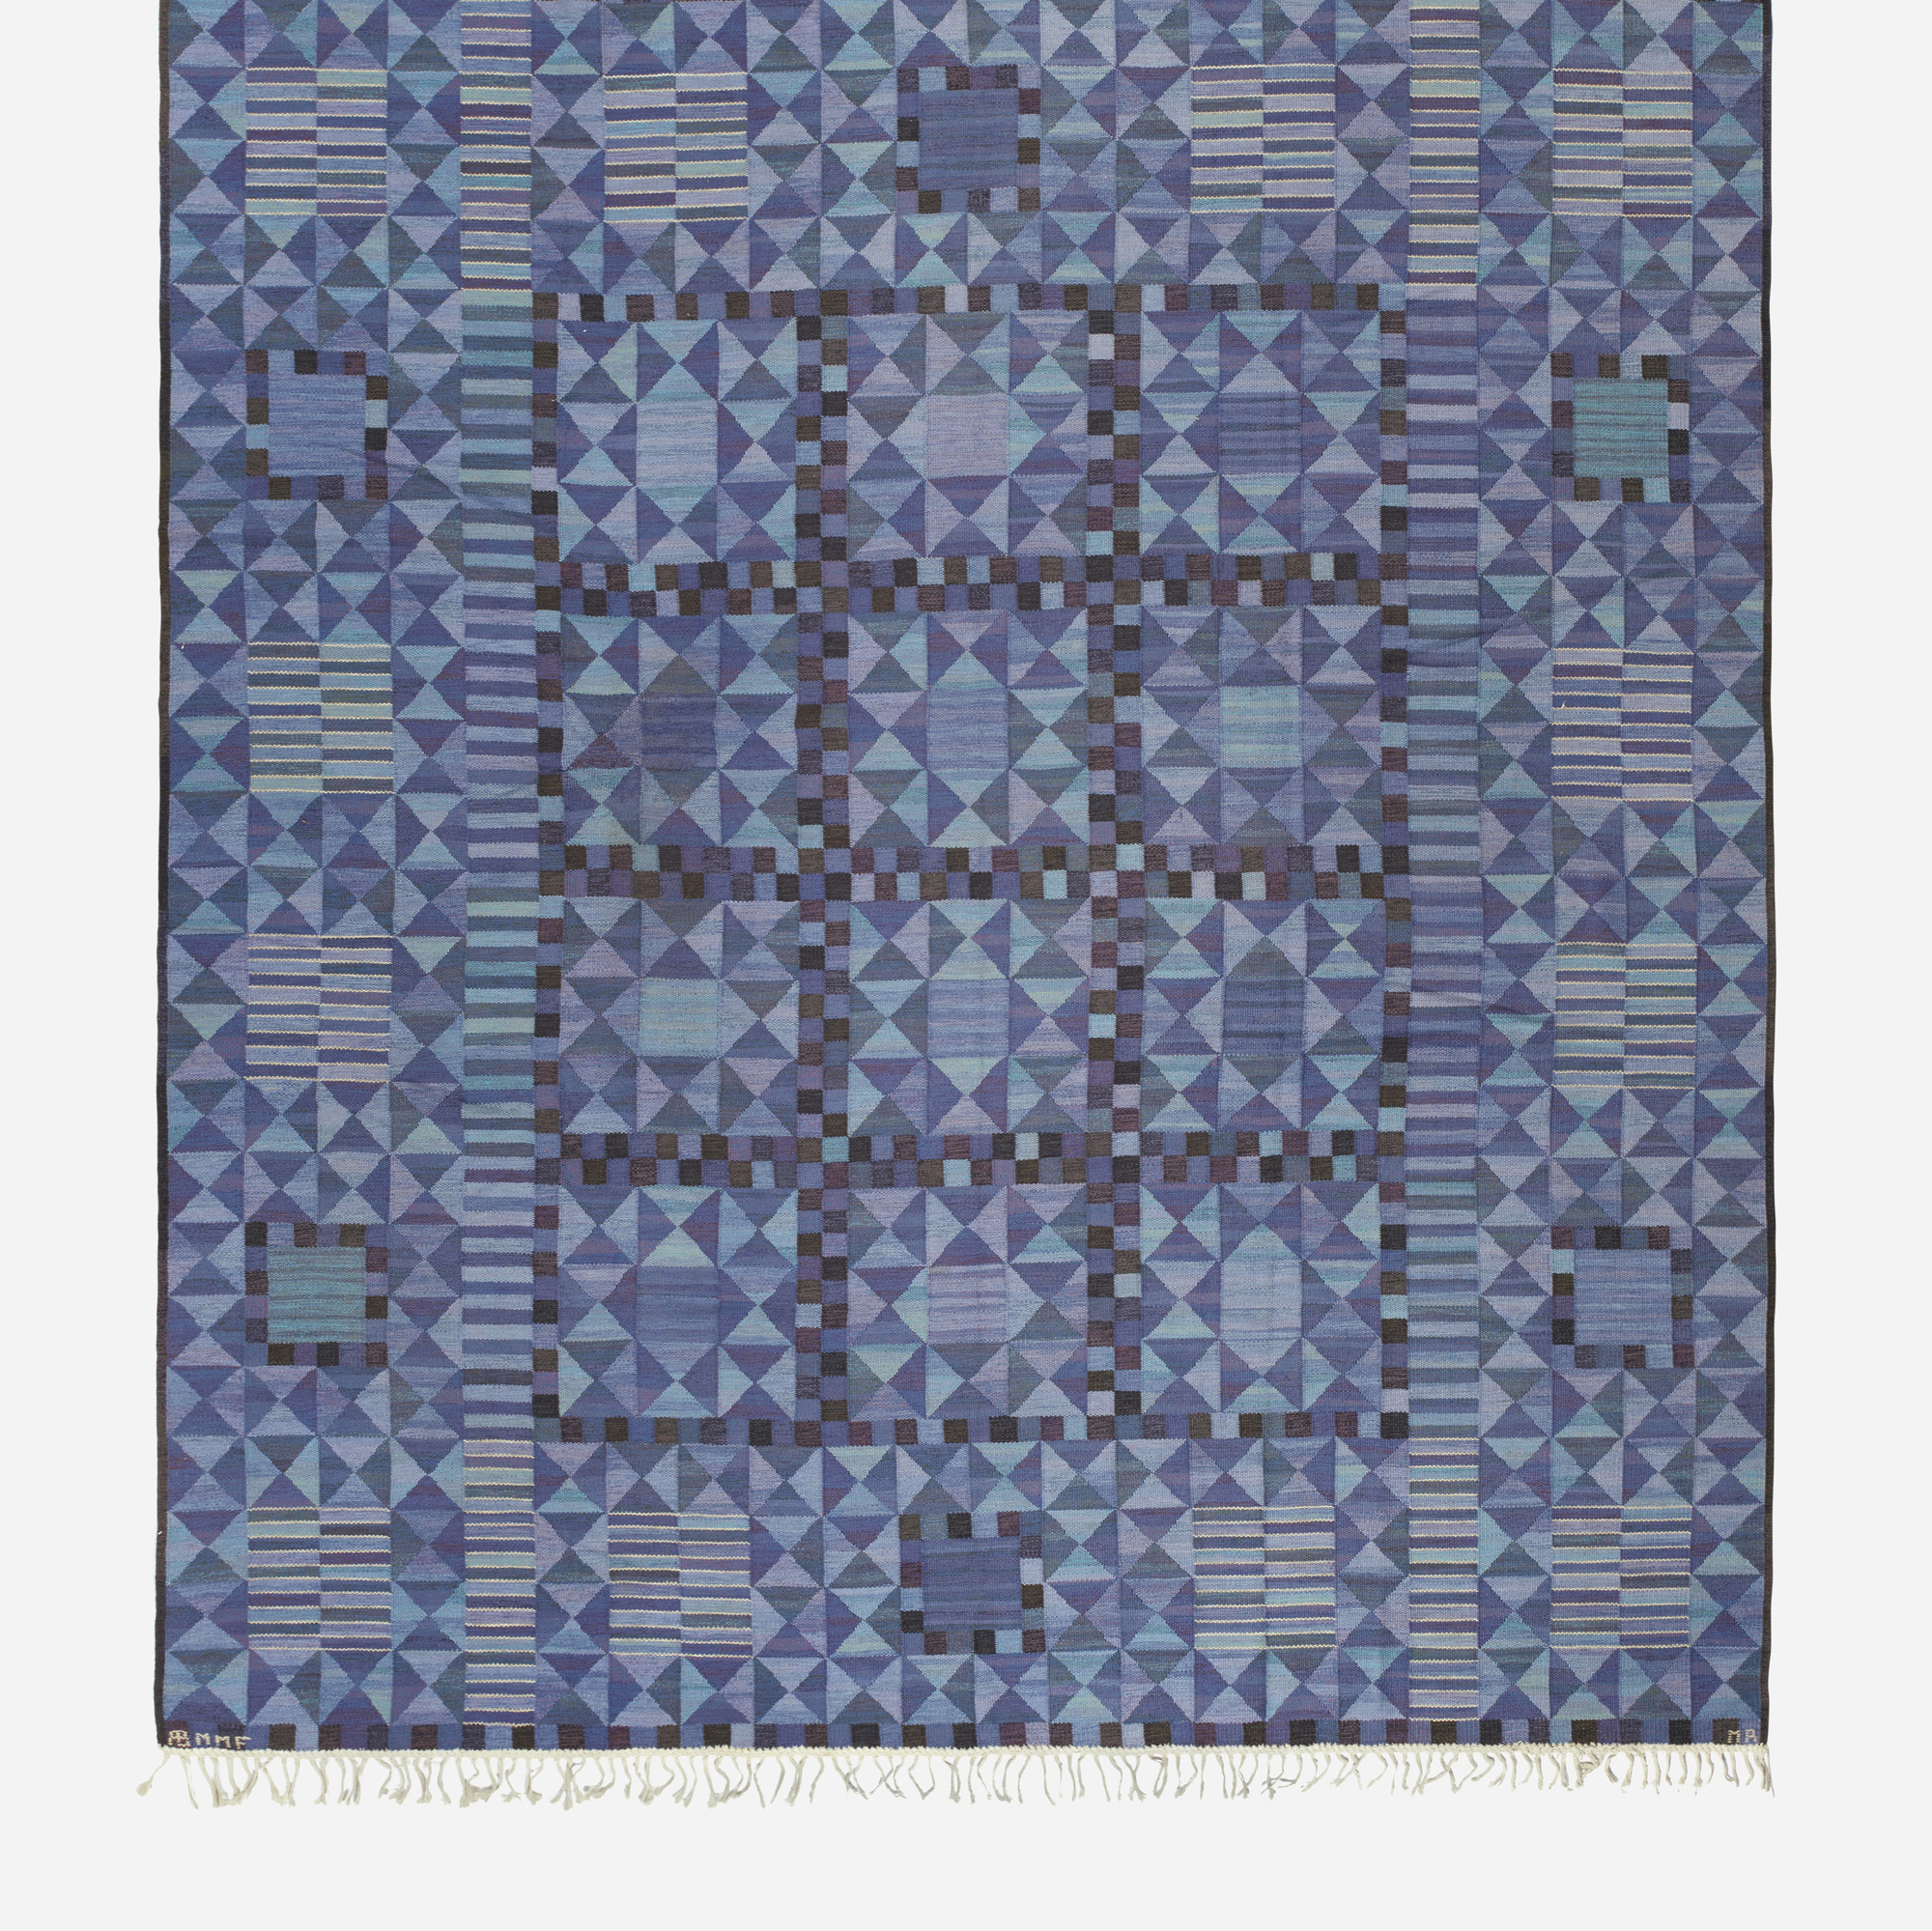 130: Marianne Richter / Rubirosa flatweave carpet (2 of 3)